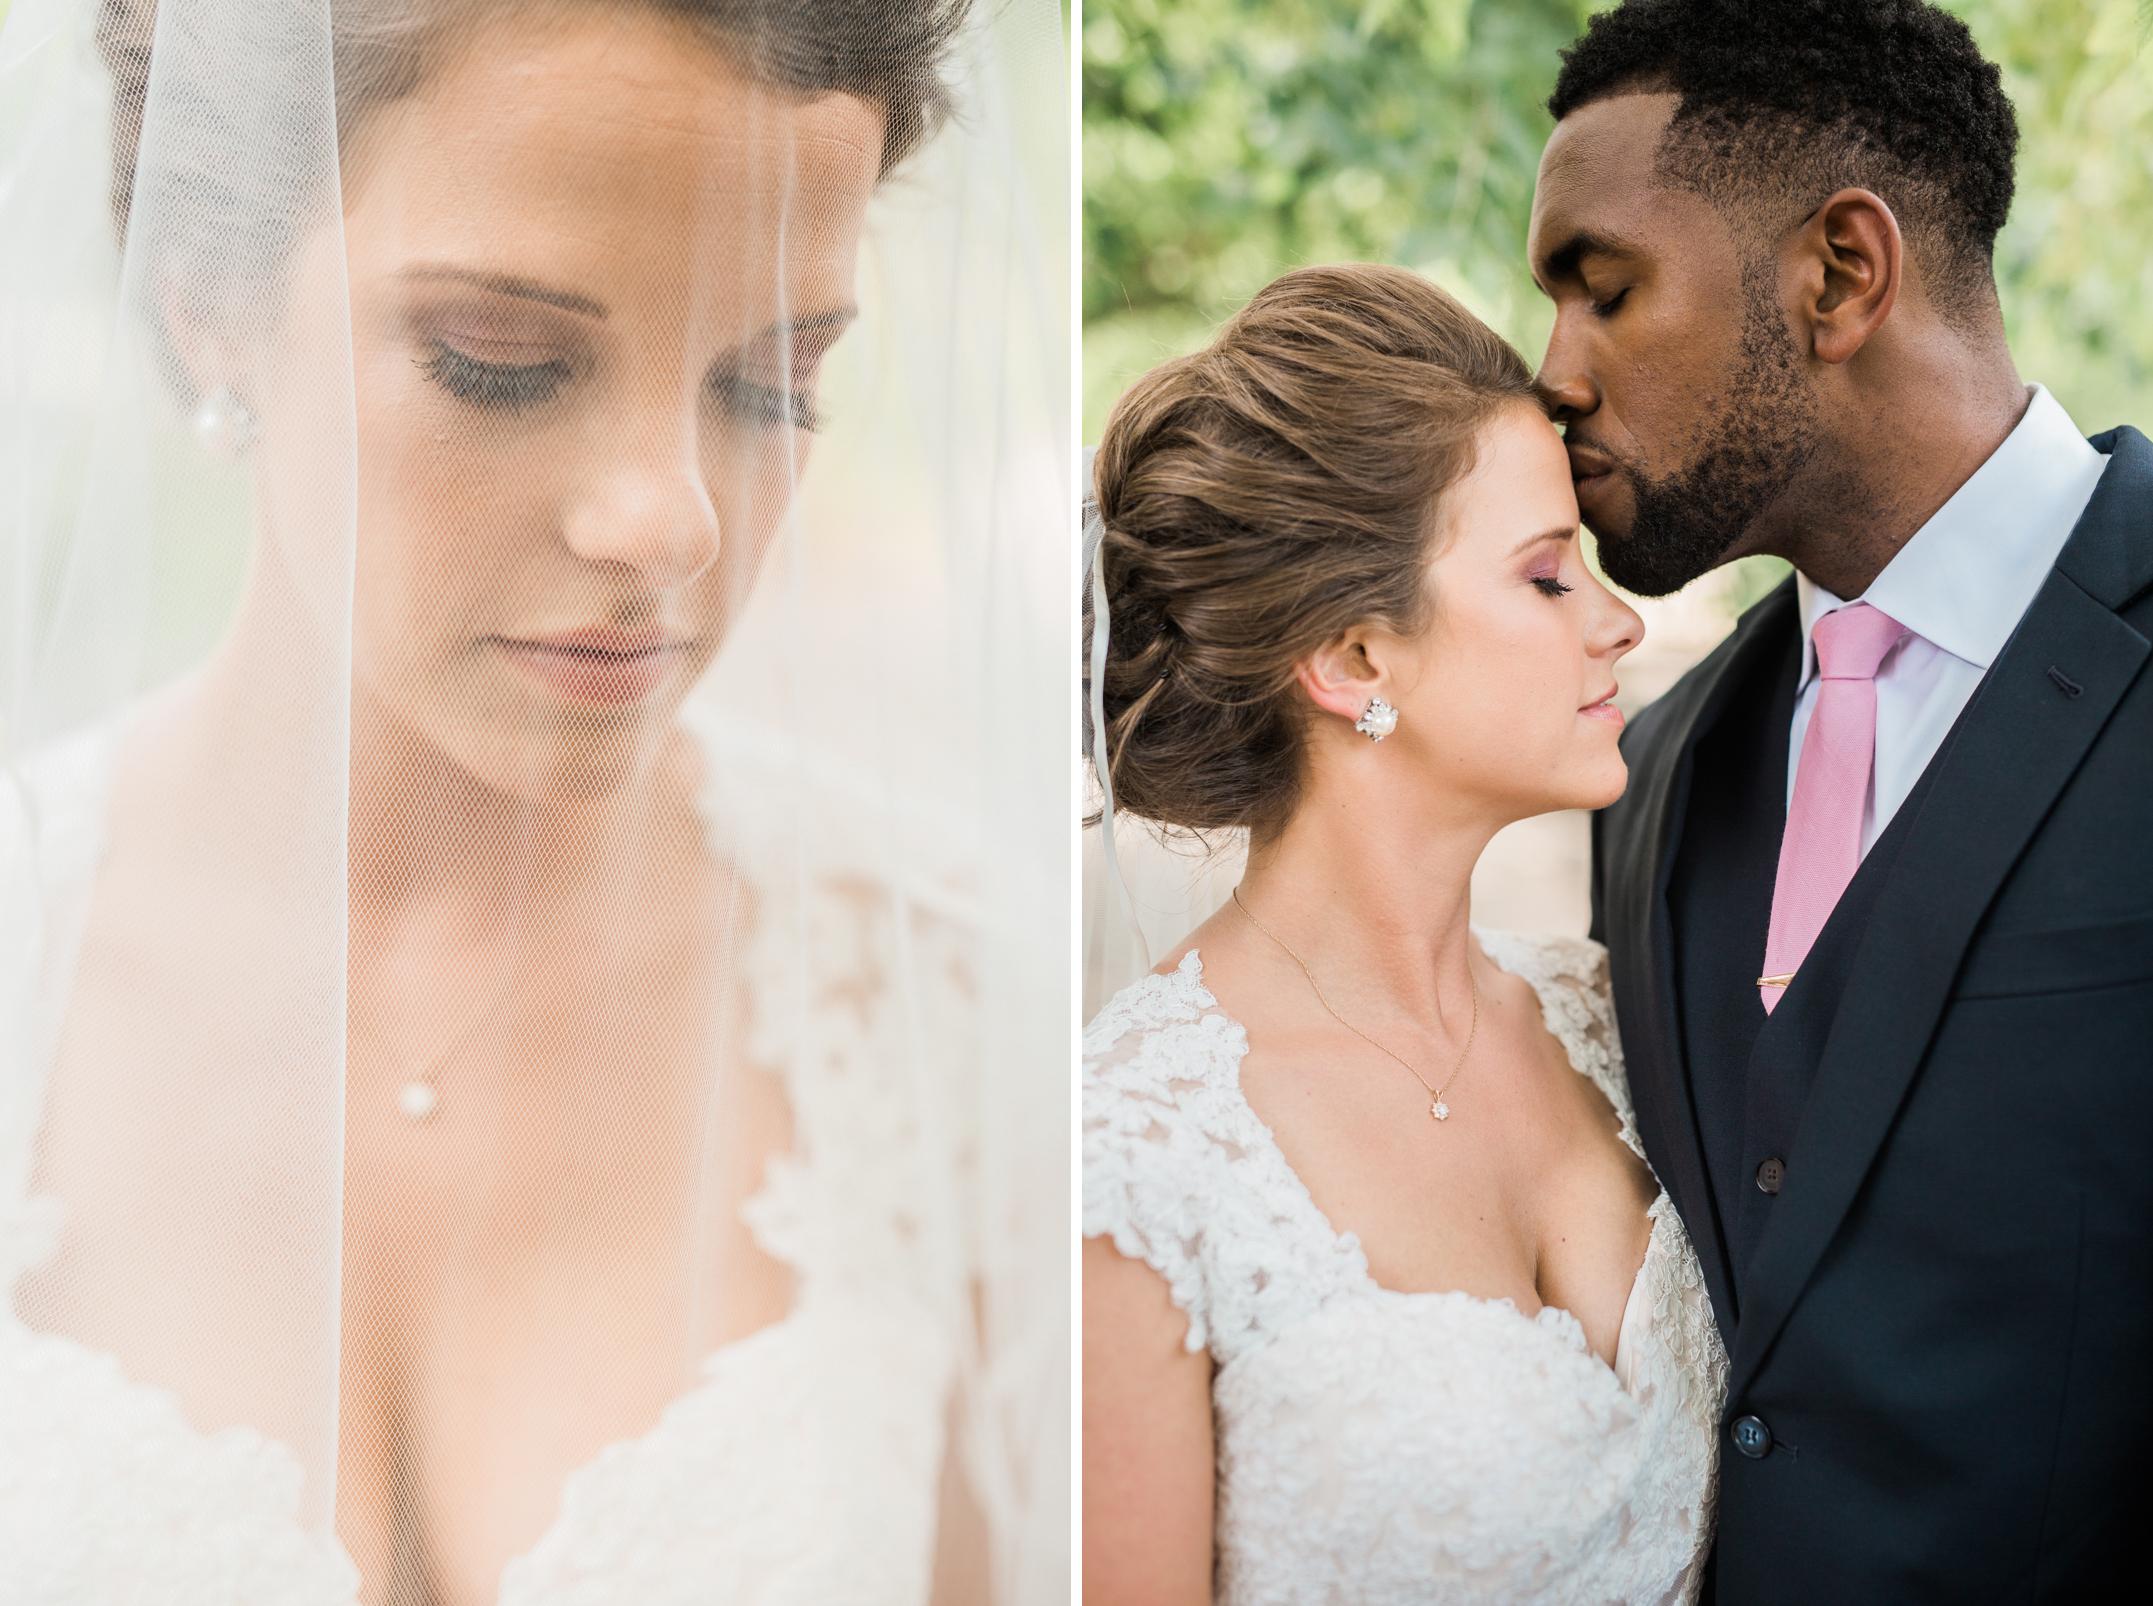 LegacyUnion-Wedding-Photographer-Glendale-CA-149 copy.jpg